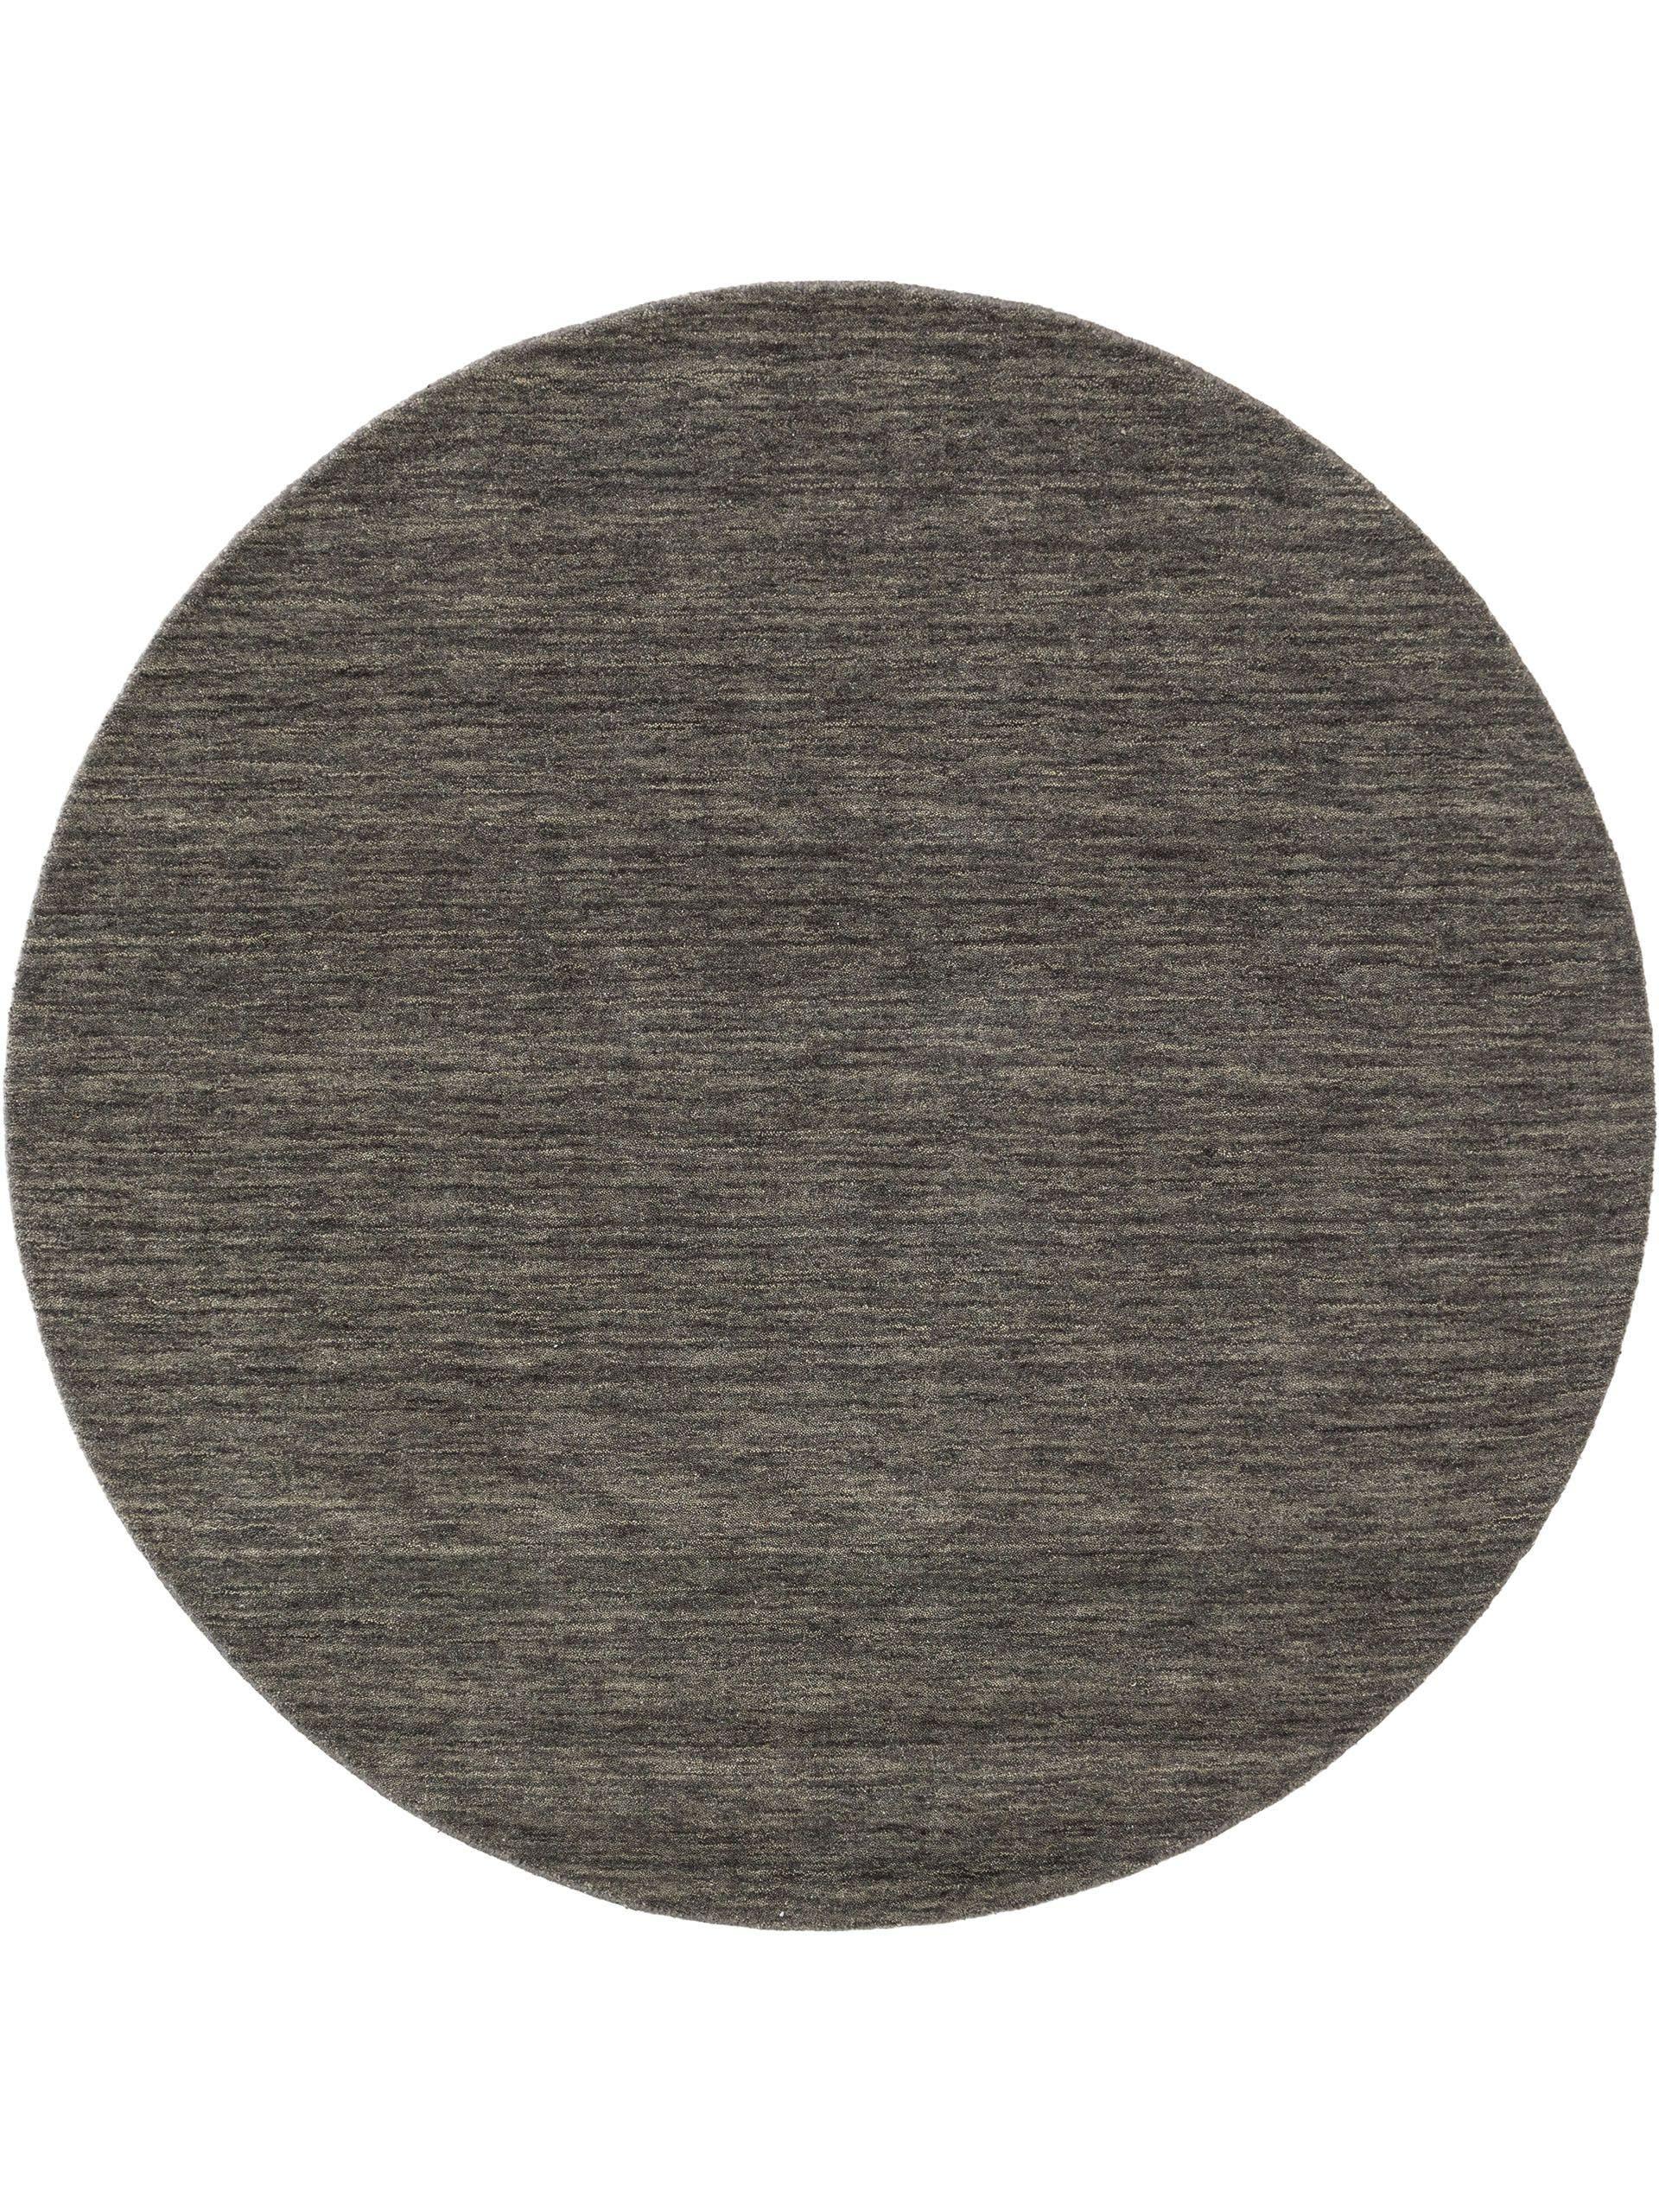 Tapis gabbeh rond gris D 120